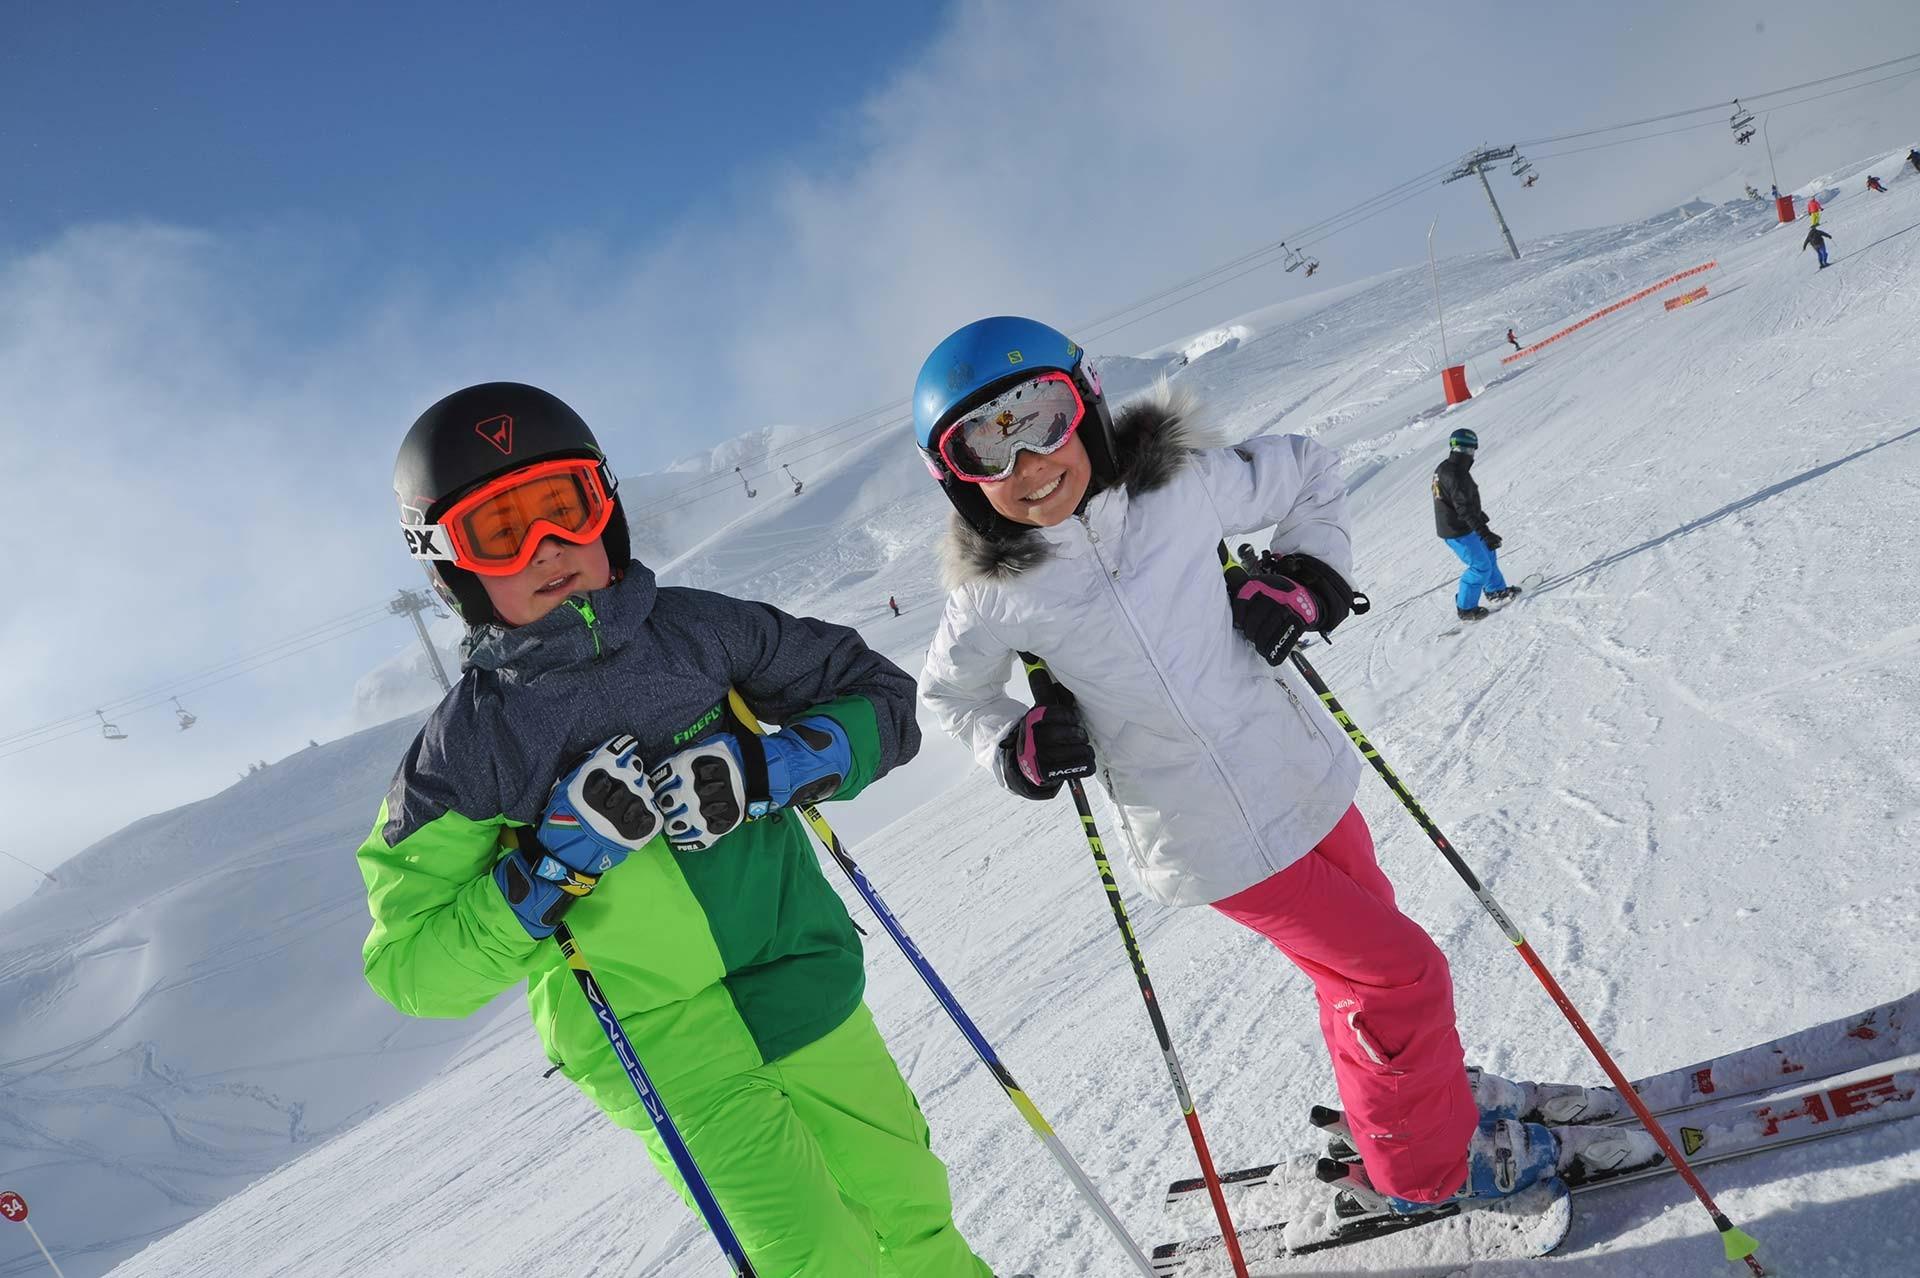 Ski lessons + daycare